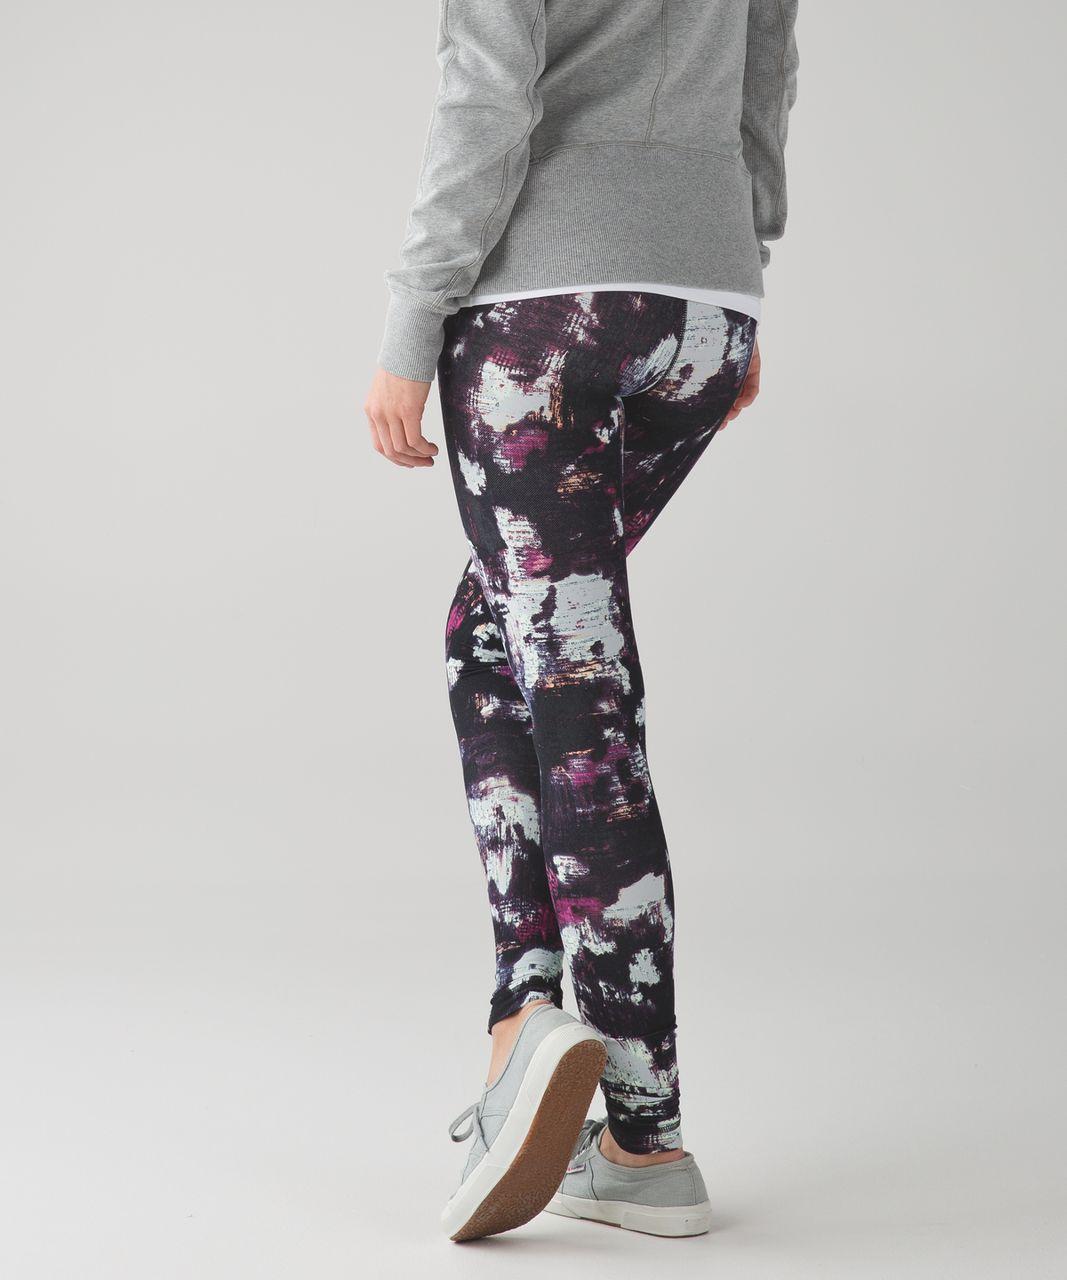 Lululemon Wunder Under Pant (Hi-Rise) - Kara Blossom Multi